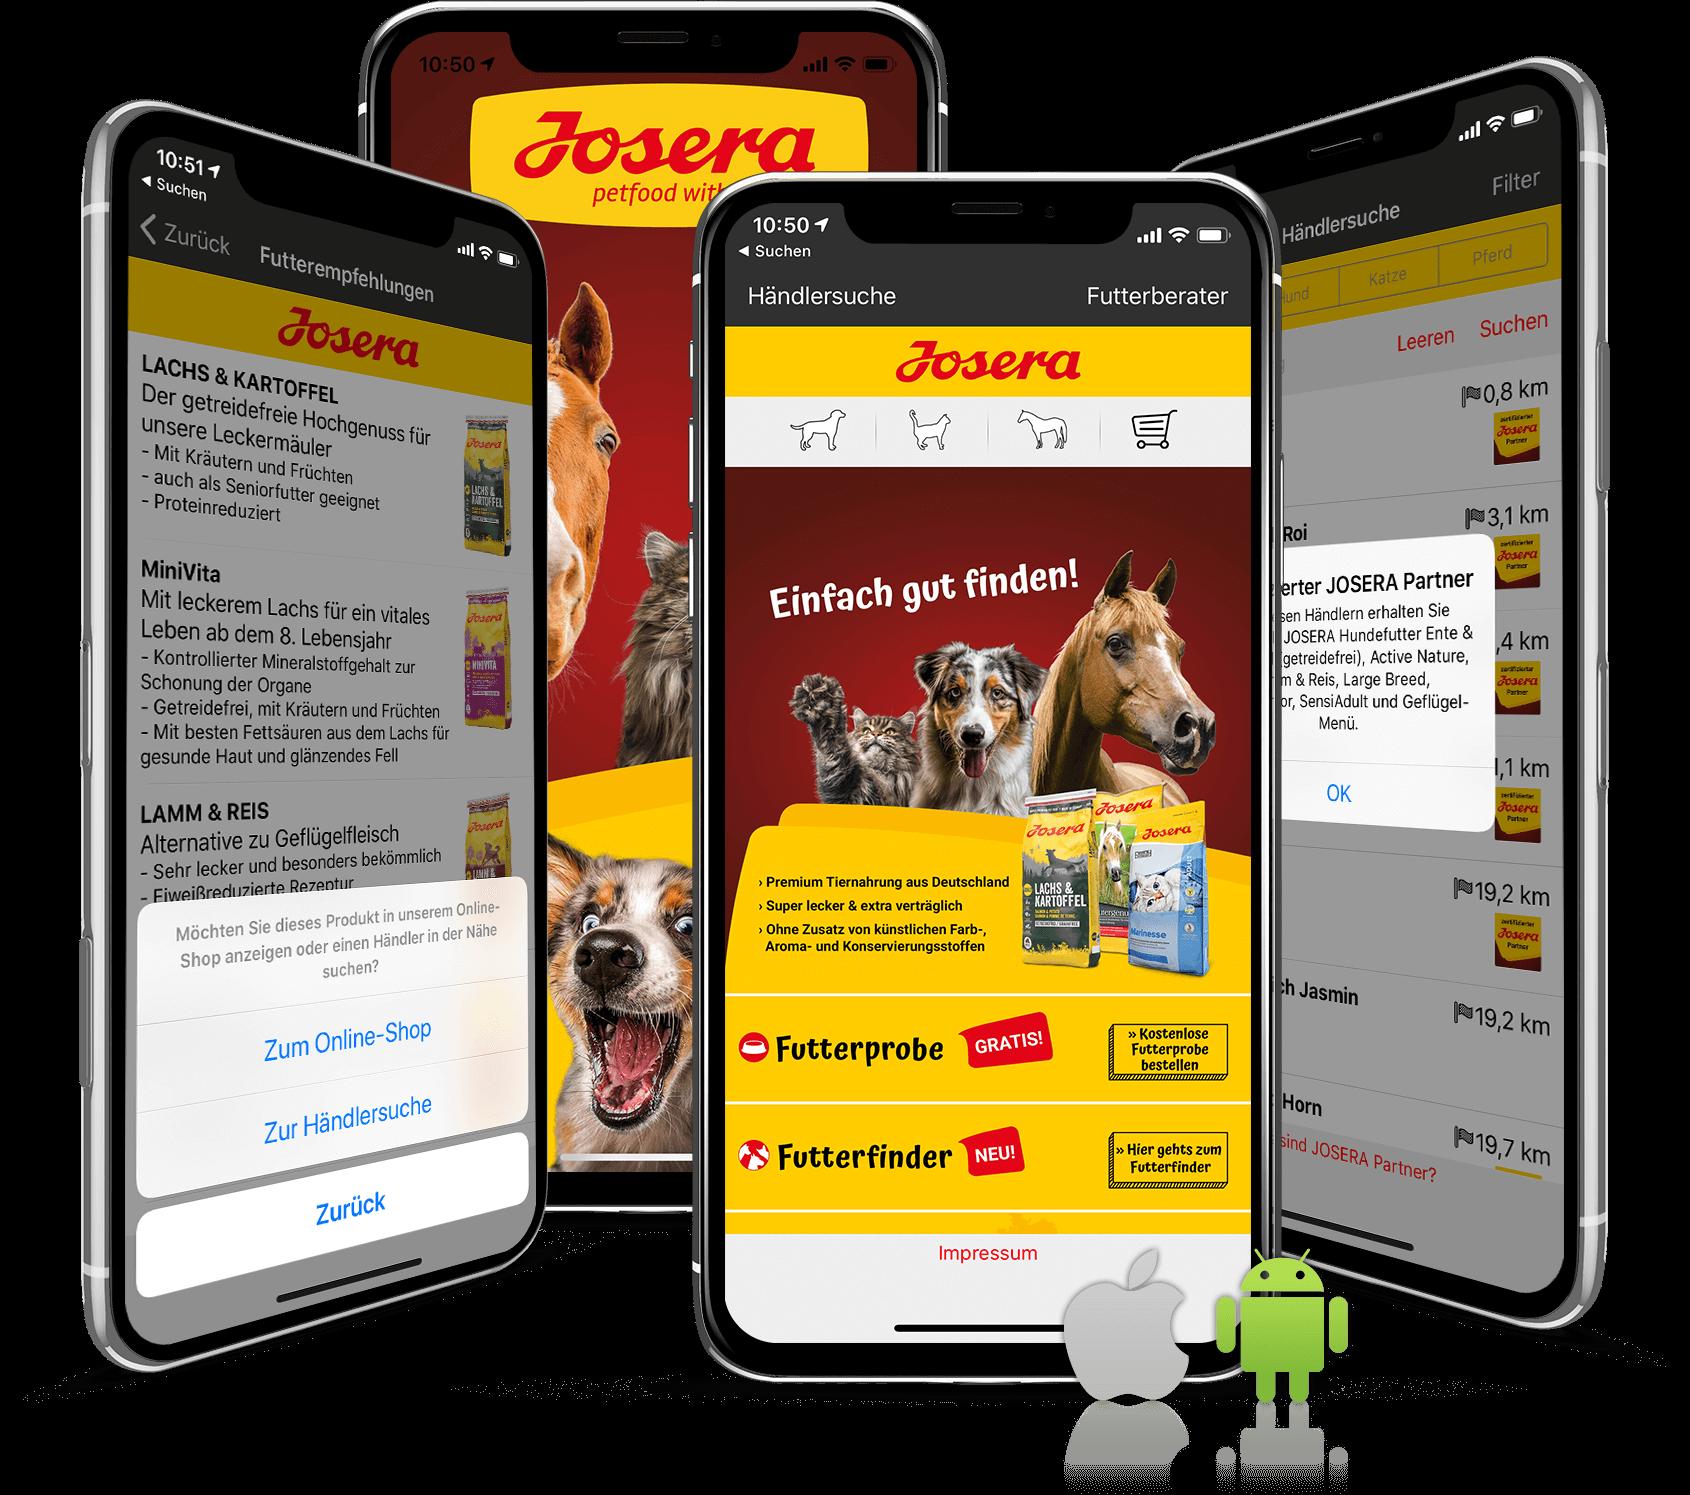 josera-futterfinder-update-app.png